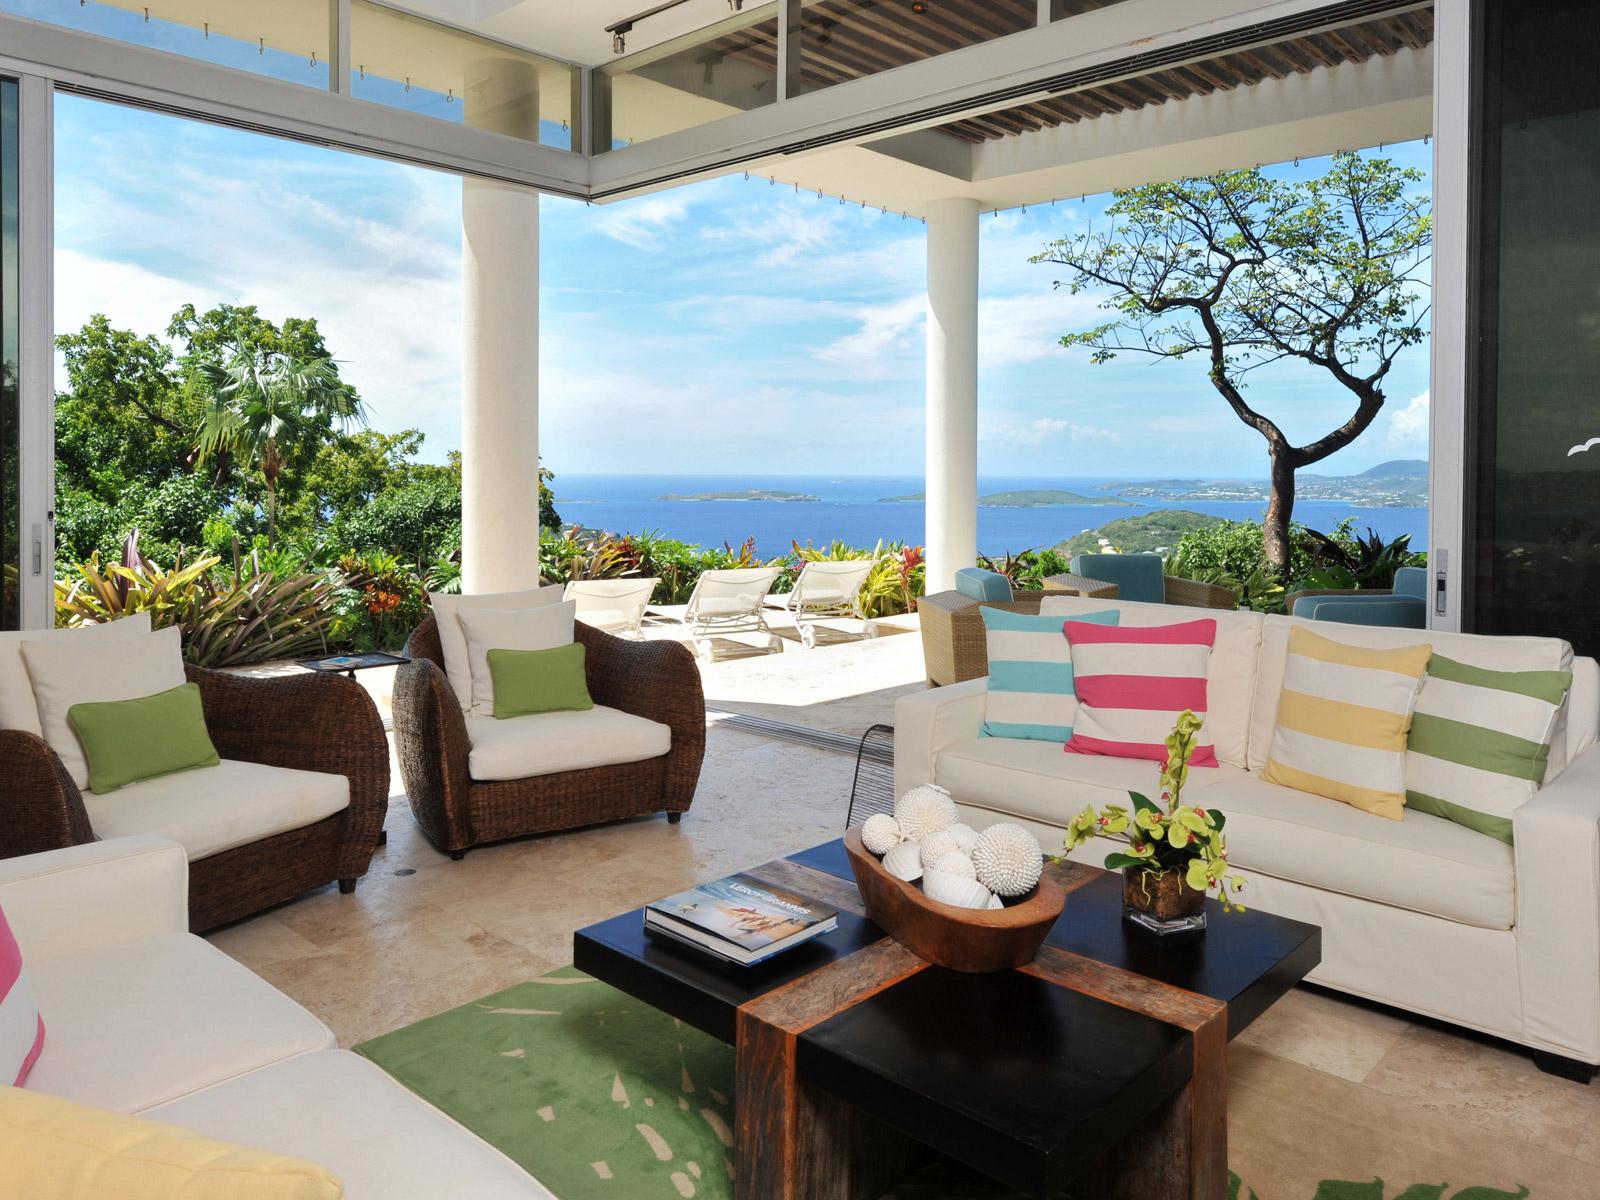 living-room-amazing-modern-outdoor-living-room-ideas